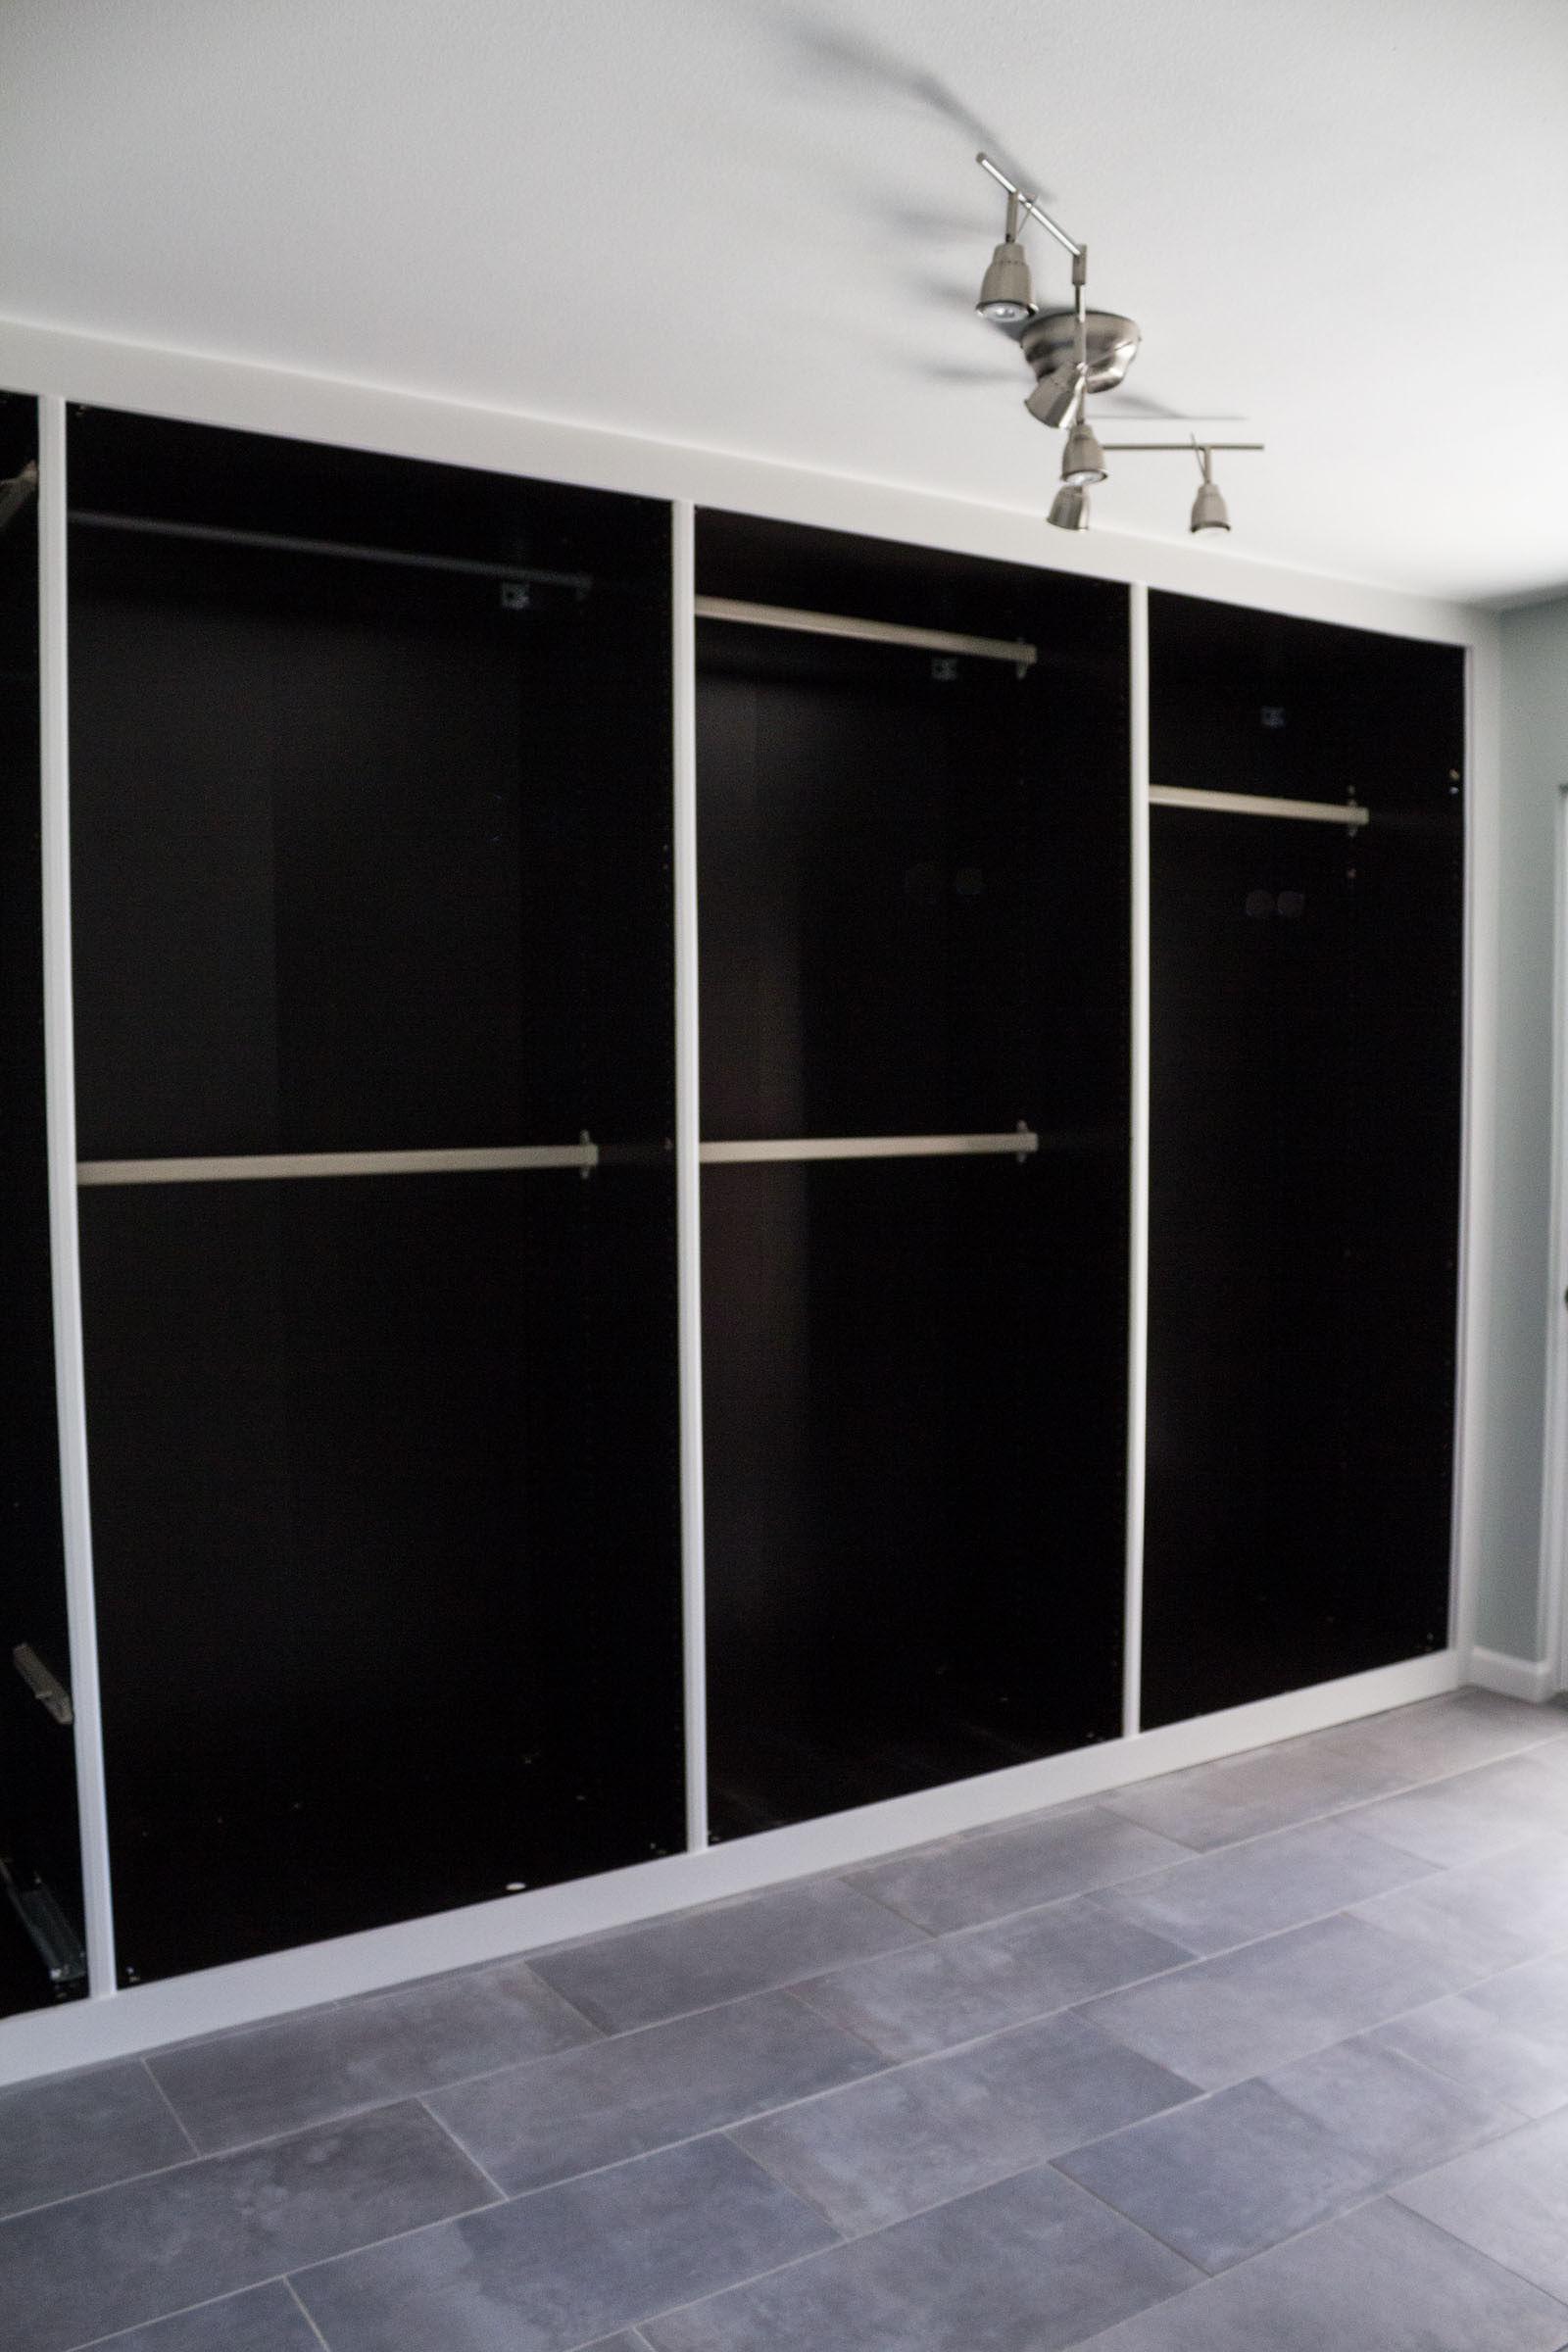 Doorless black bedroom closet built ins with clothing rods